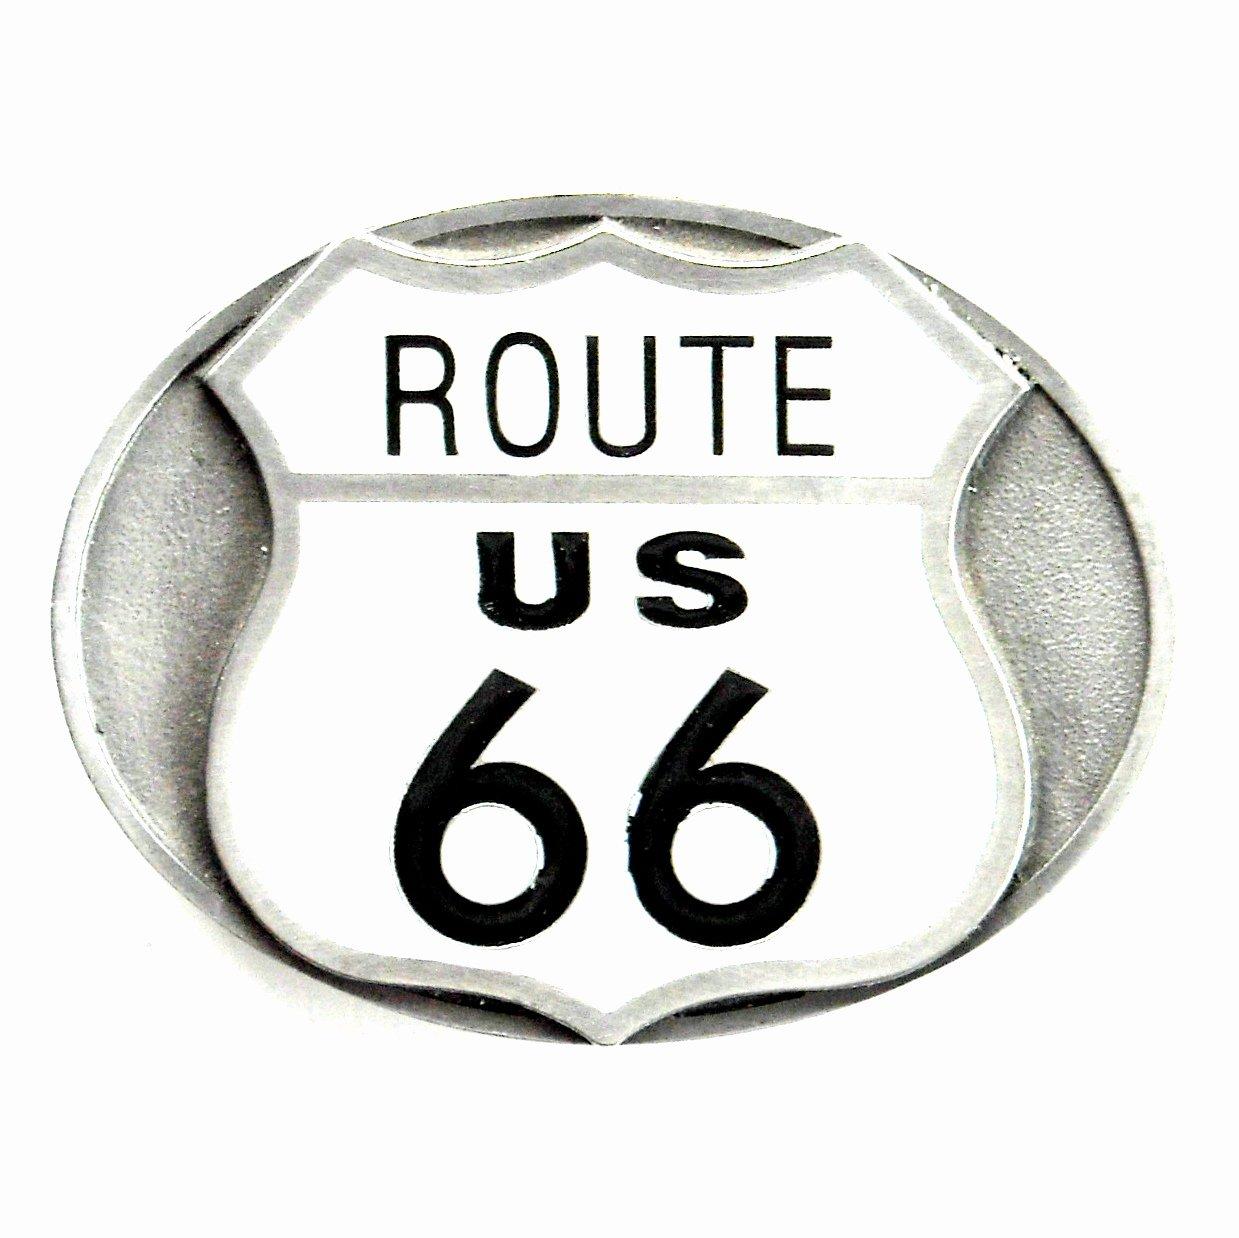 Route 66 US Siskiyou Oregon Pewter Belt Buckle